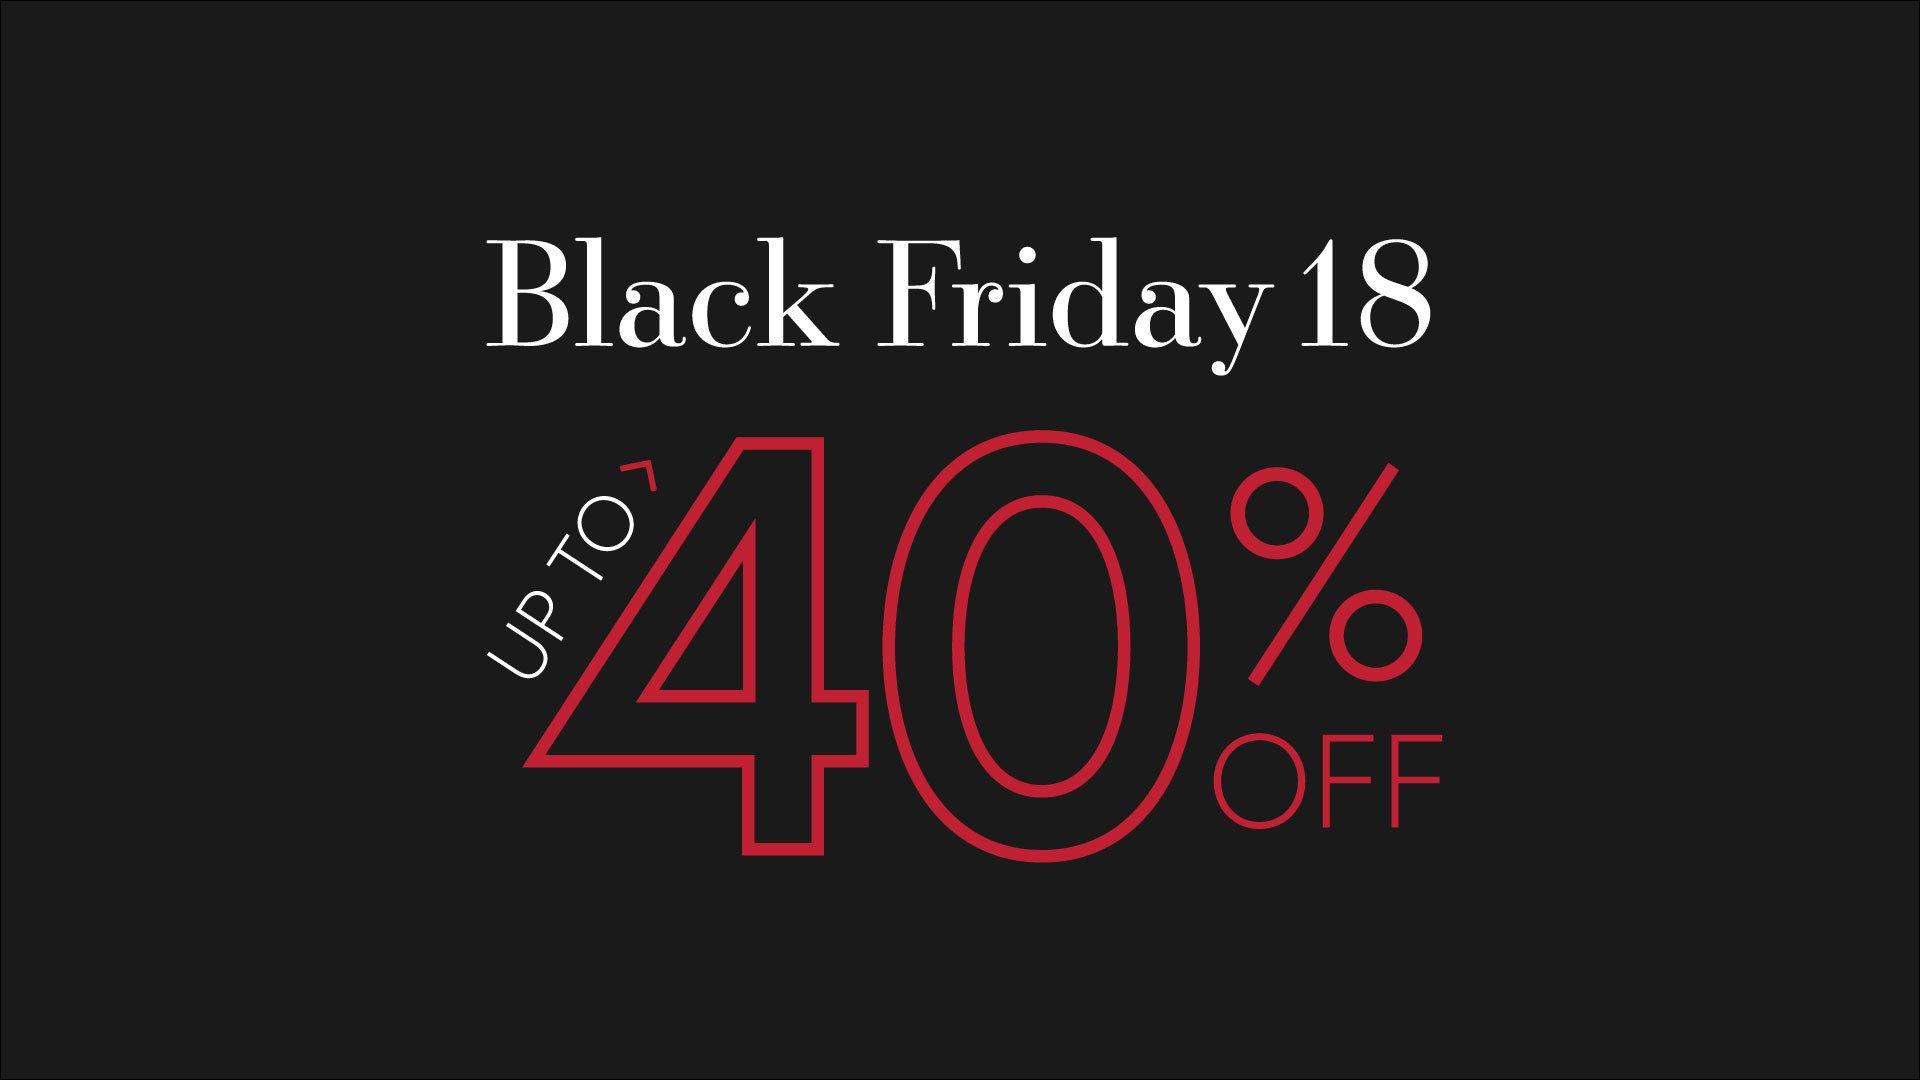 Black Friday 2018 – Save Big This Black Friday!